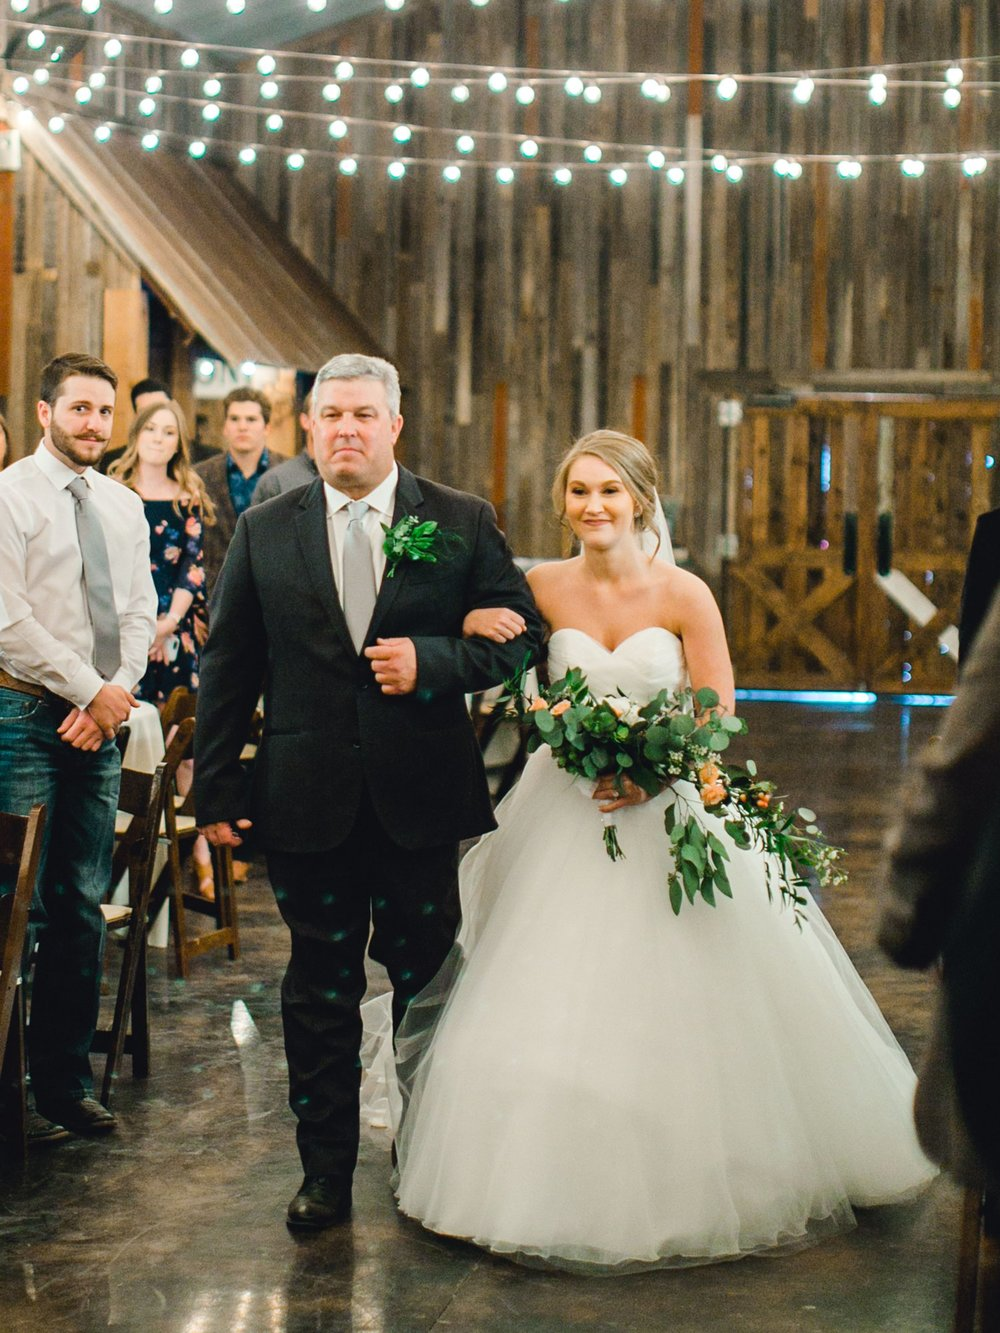 kayla-jacob-dow-cotton-creek-barn-lubbock-wedding-photographer-alleej0076.jpg